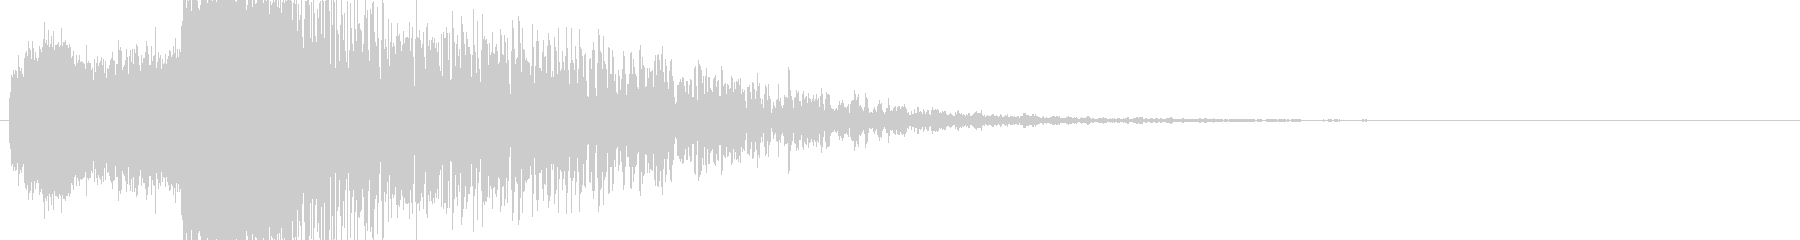 【SE】爆発音05(SF超爆発〜連続)の未再生の波形